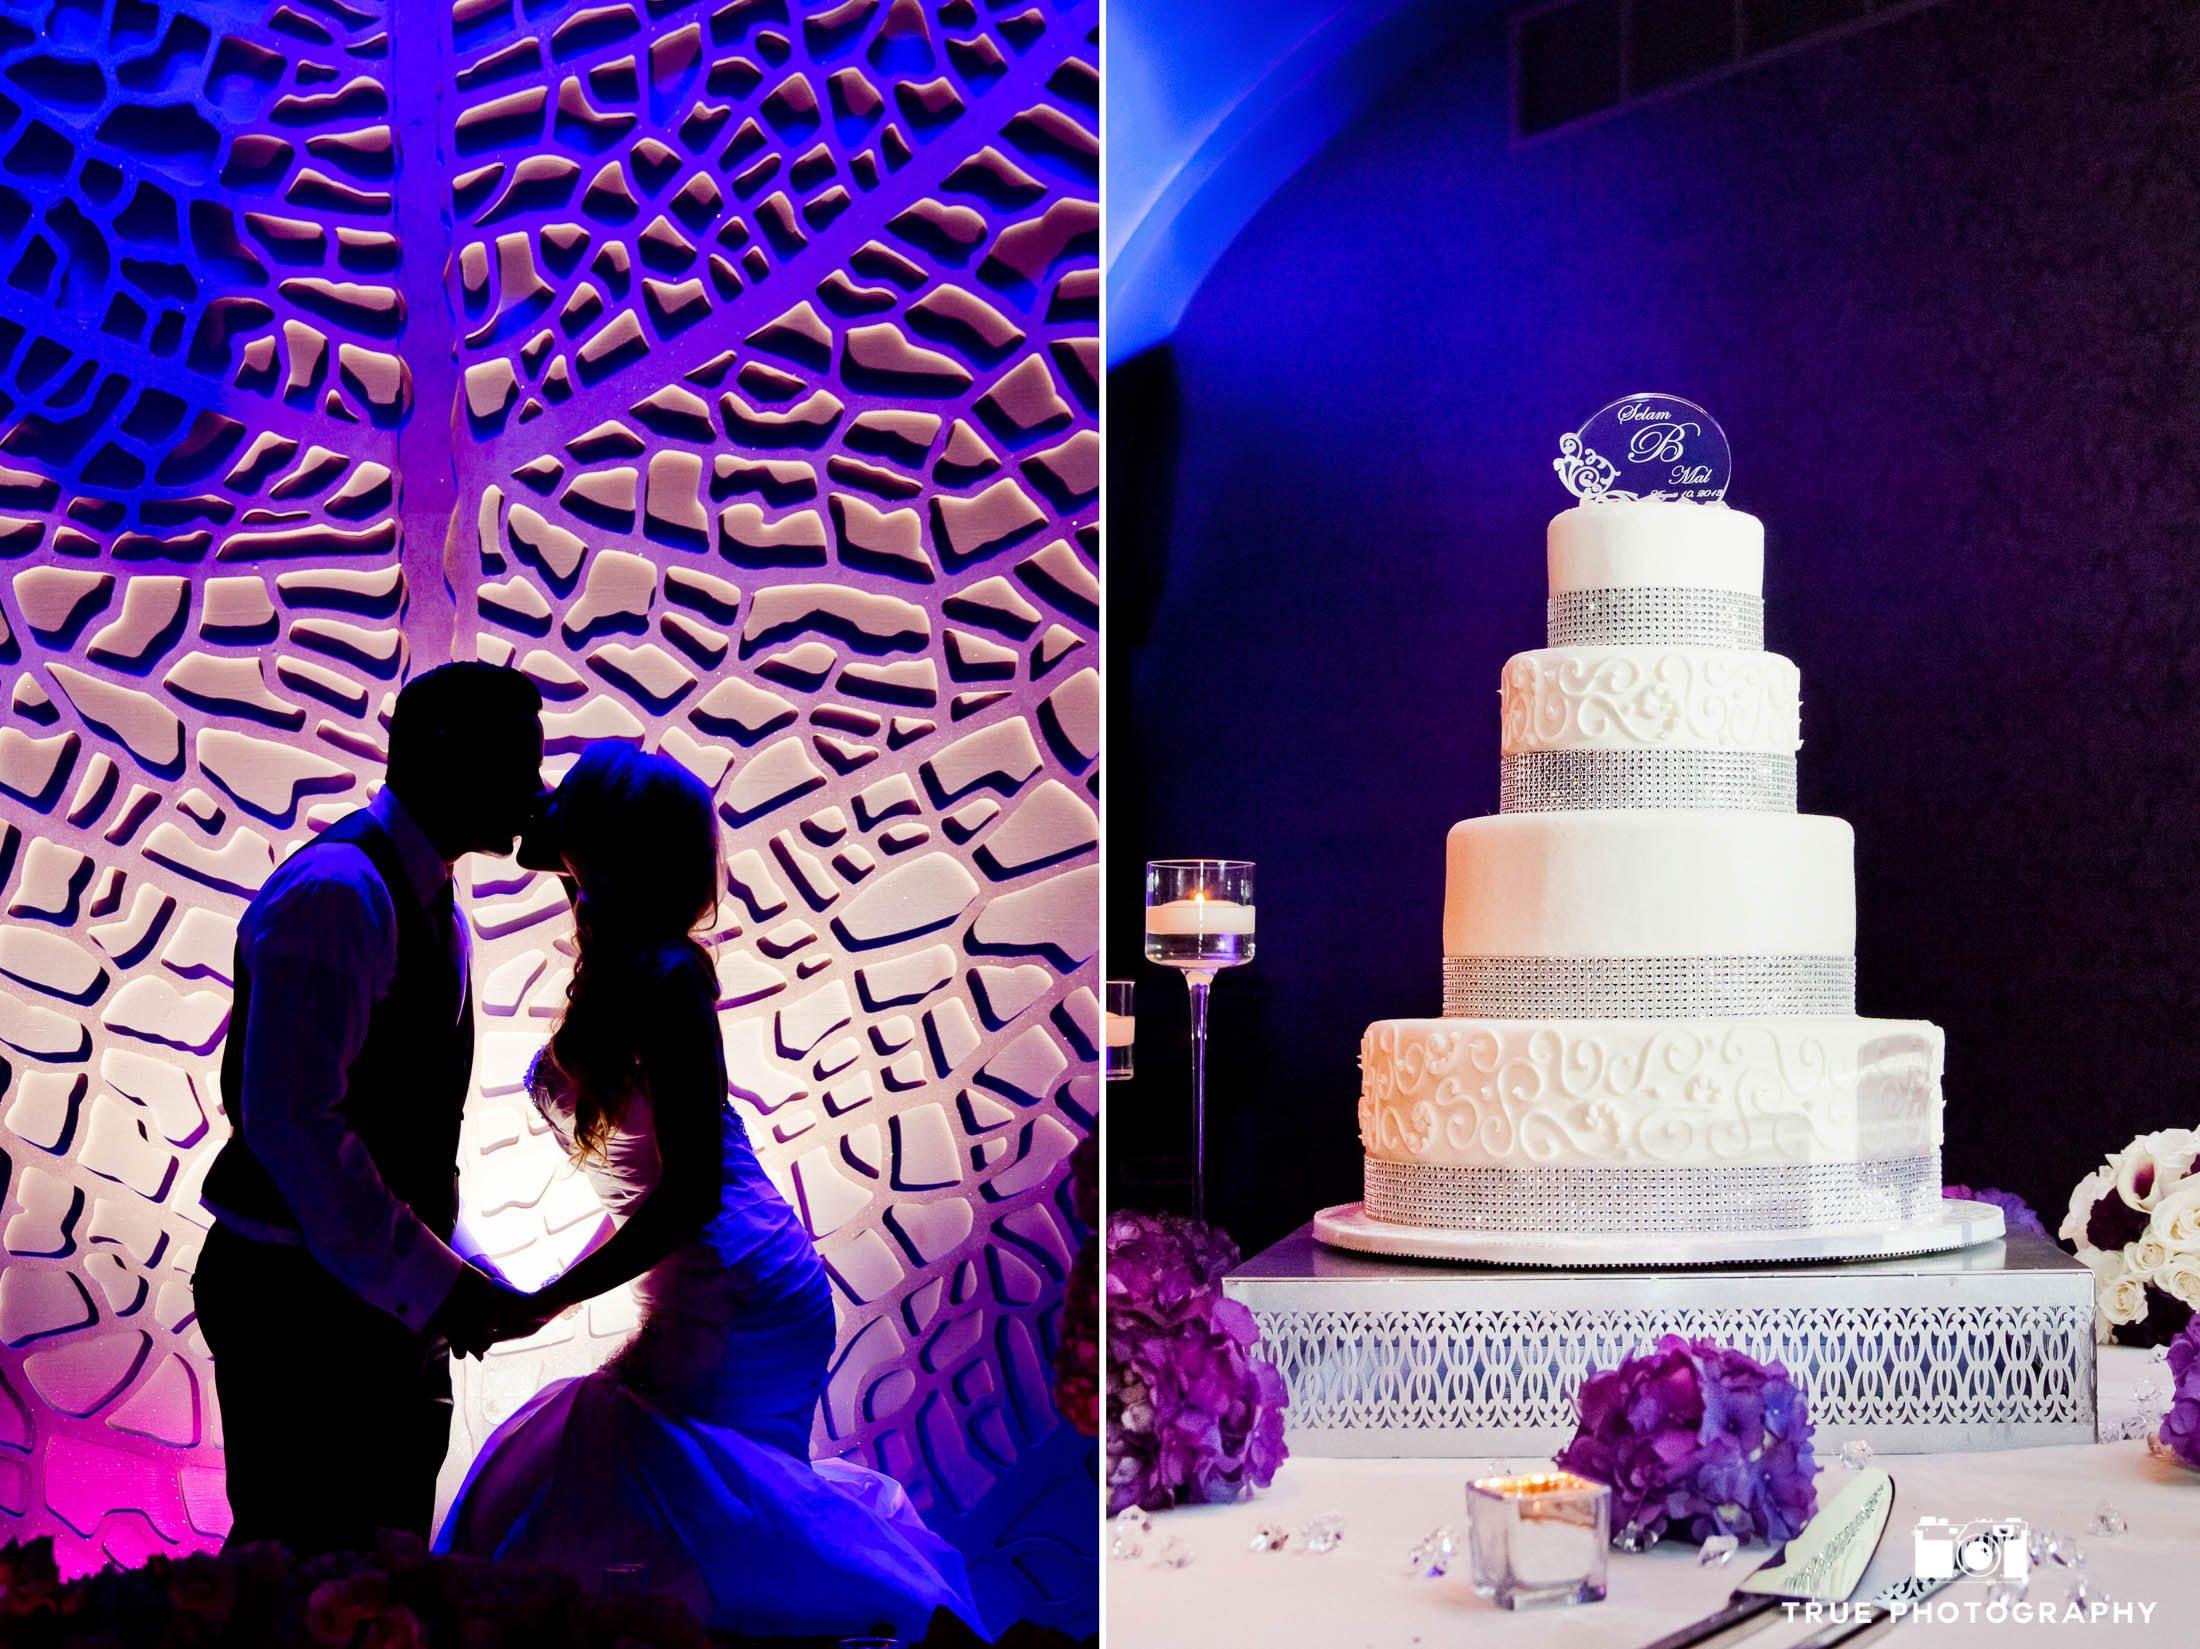 Modern wedding couple with dramatic purple background and purple wedding cake